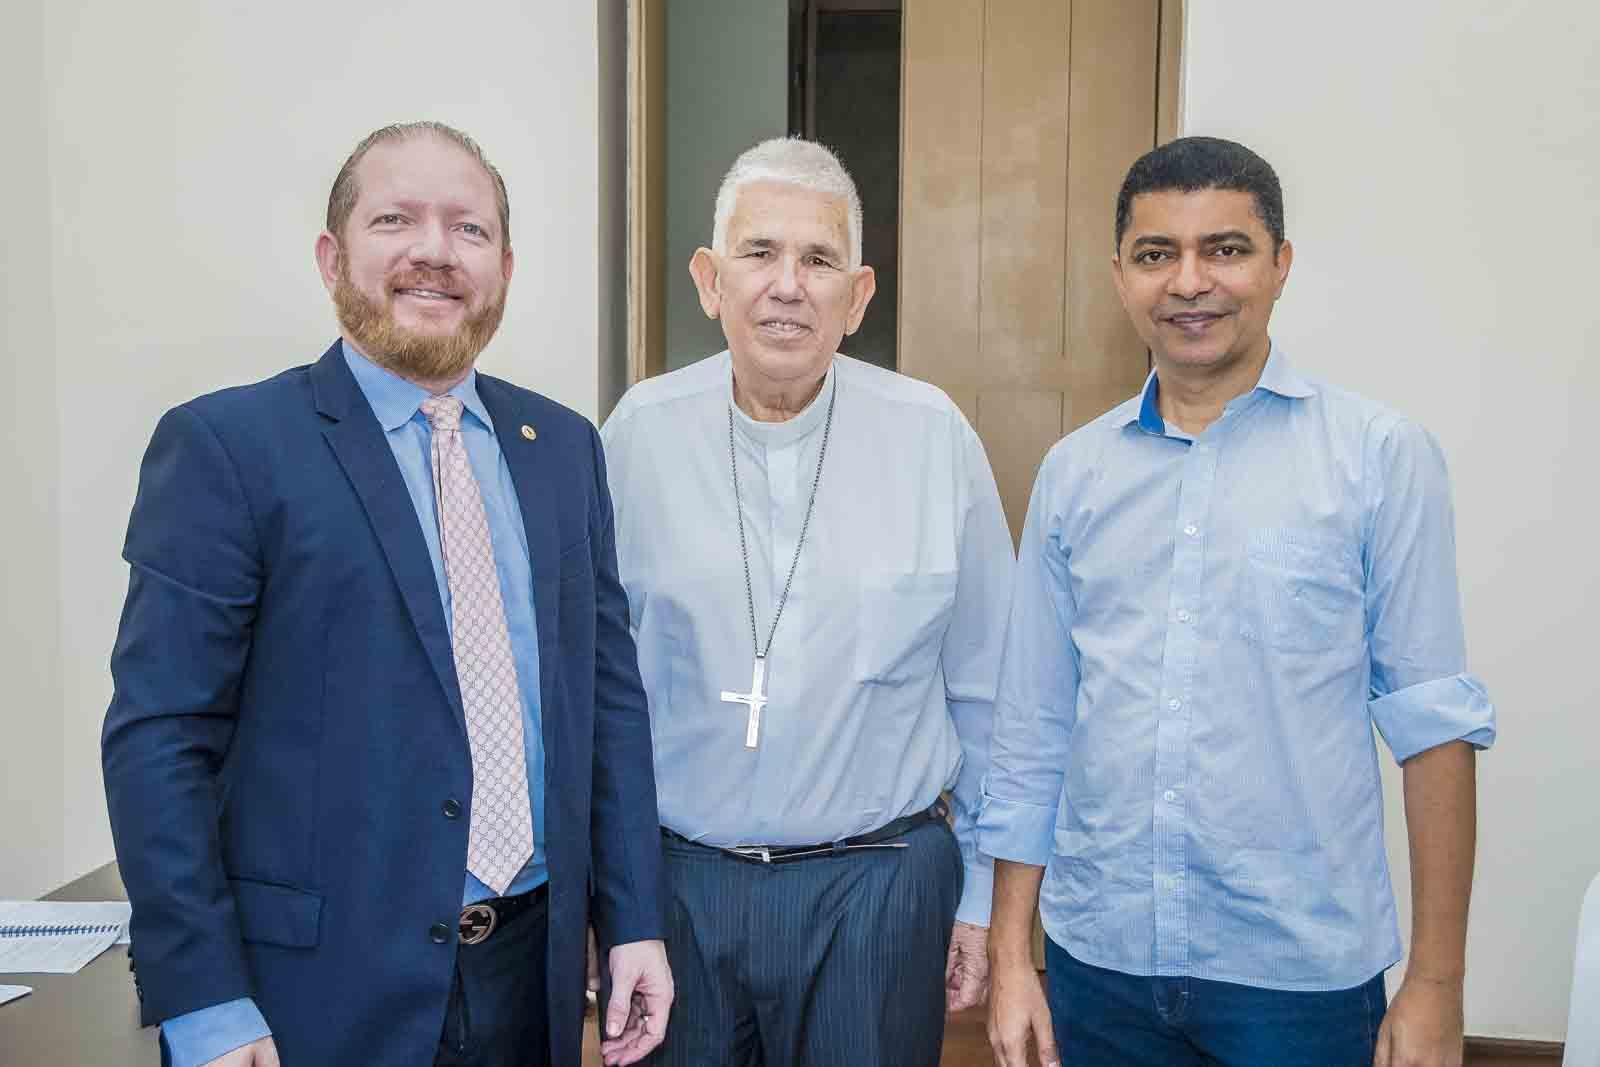 Presidente Othelino Neto faz visita de cortesia ao arcebispo Dom Belisário